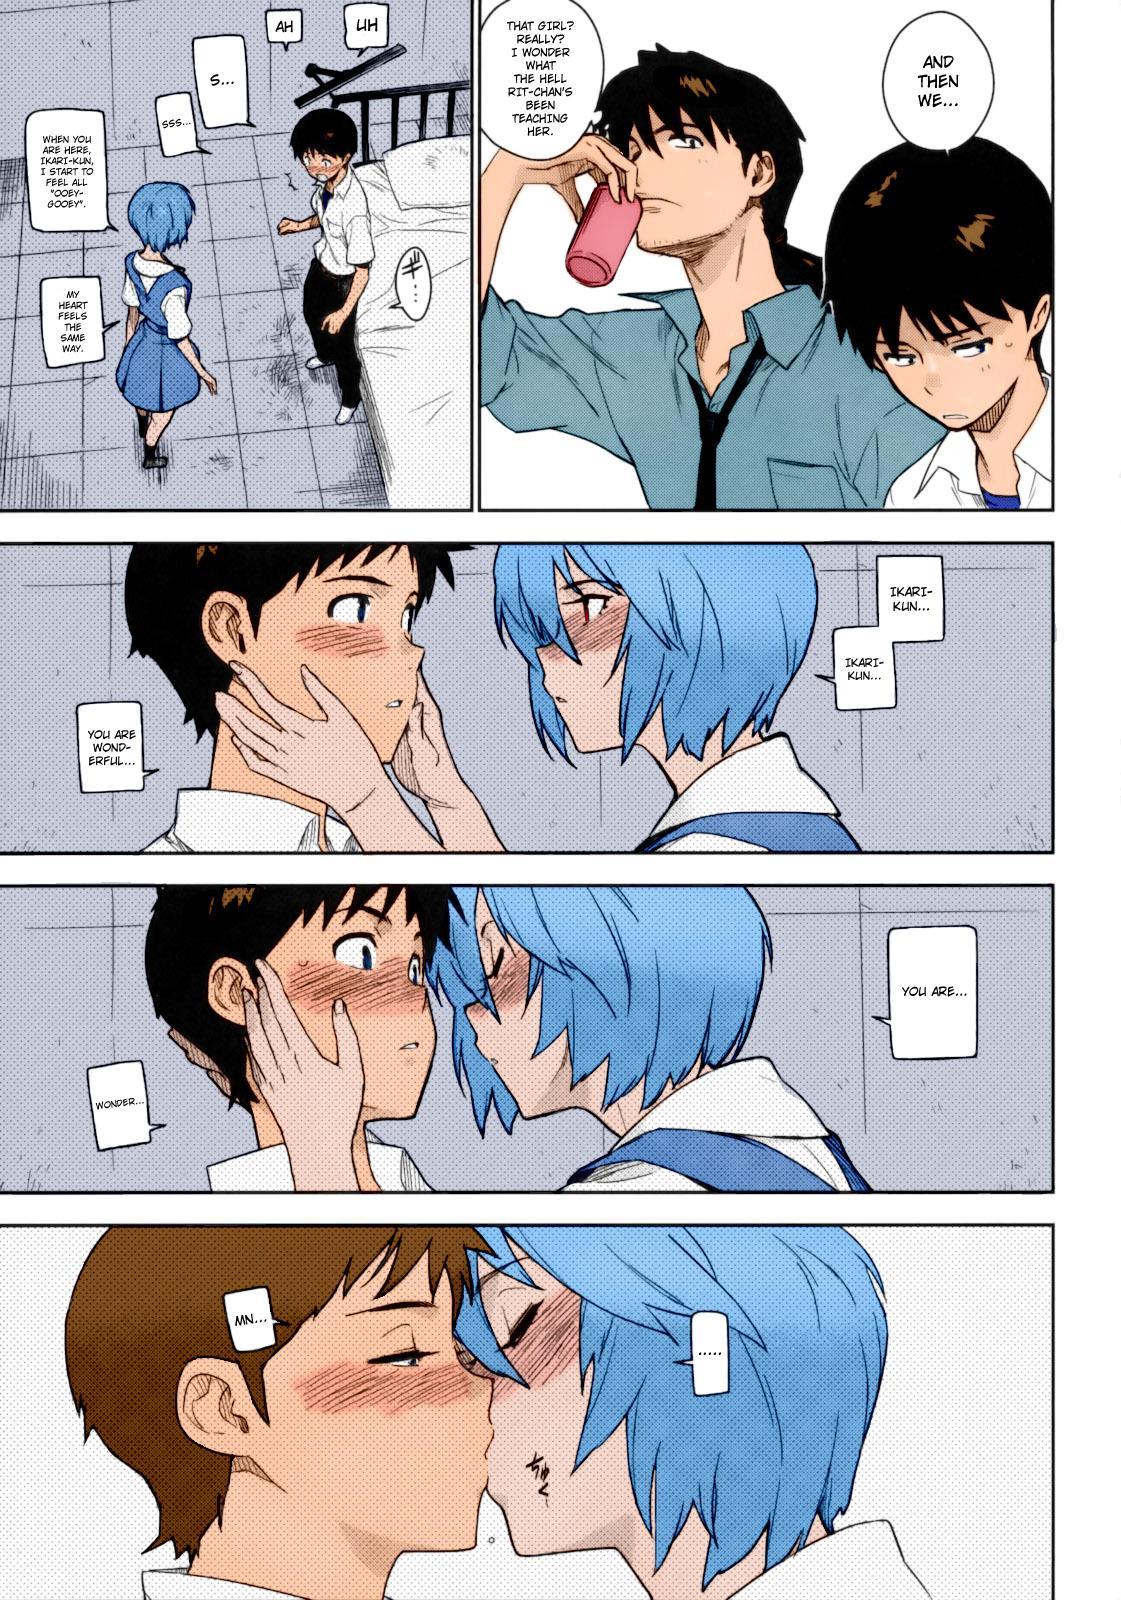 [enuma elish (Yukimi)] LIKE A BEAST (Neon Genesis Evangelion) [English] ==Strange Companions== [Colorized] 5